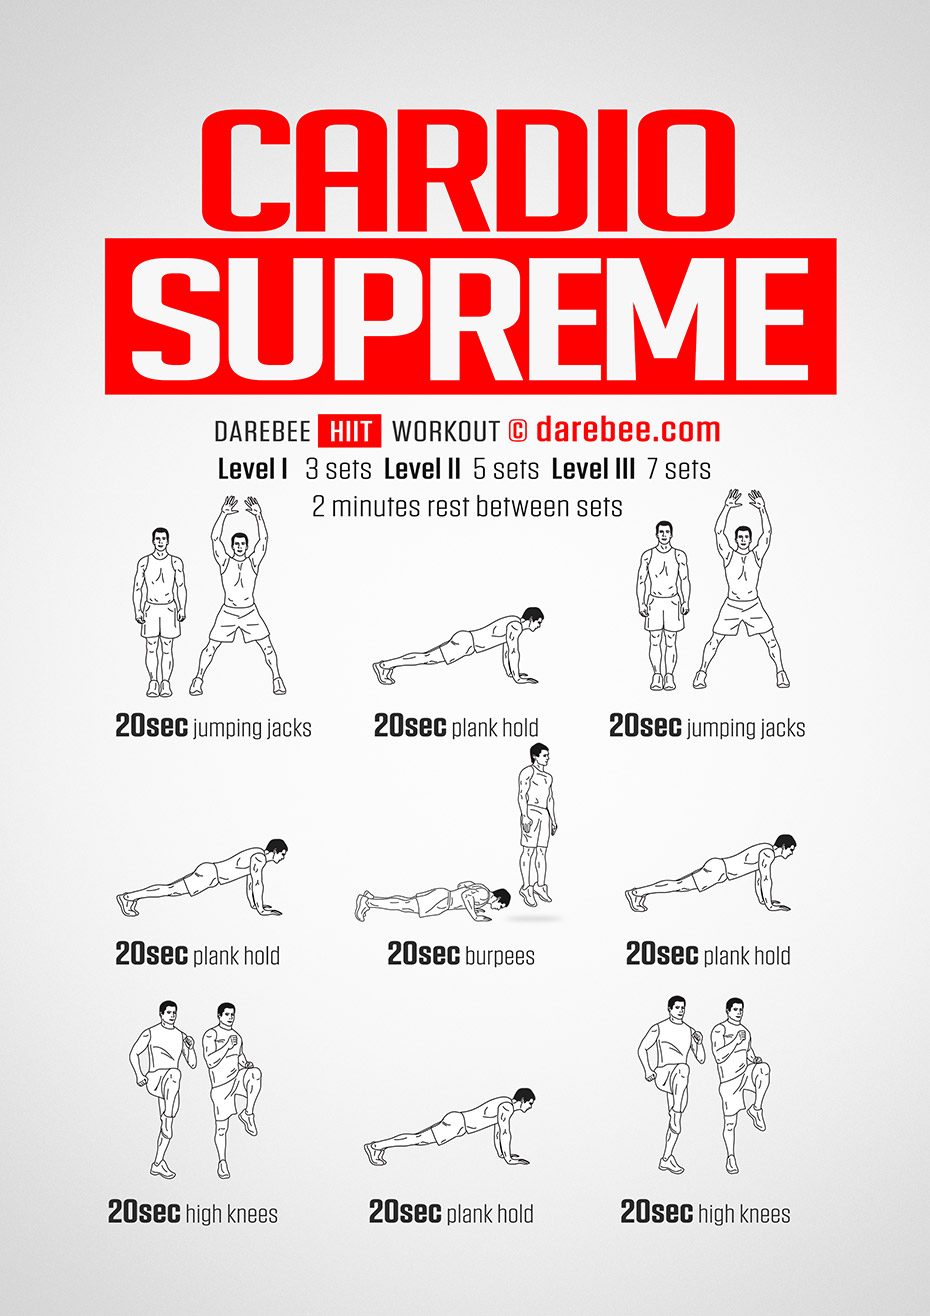 Cardio Supreme Workout